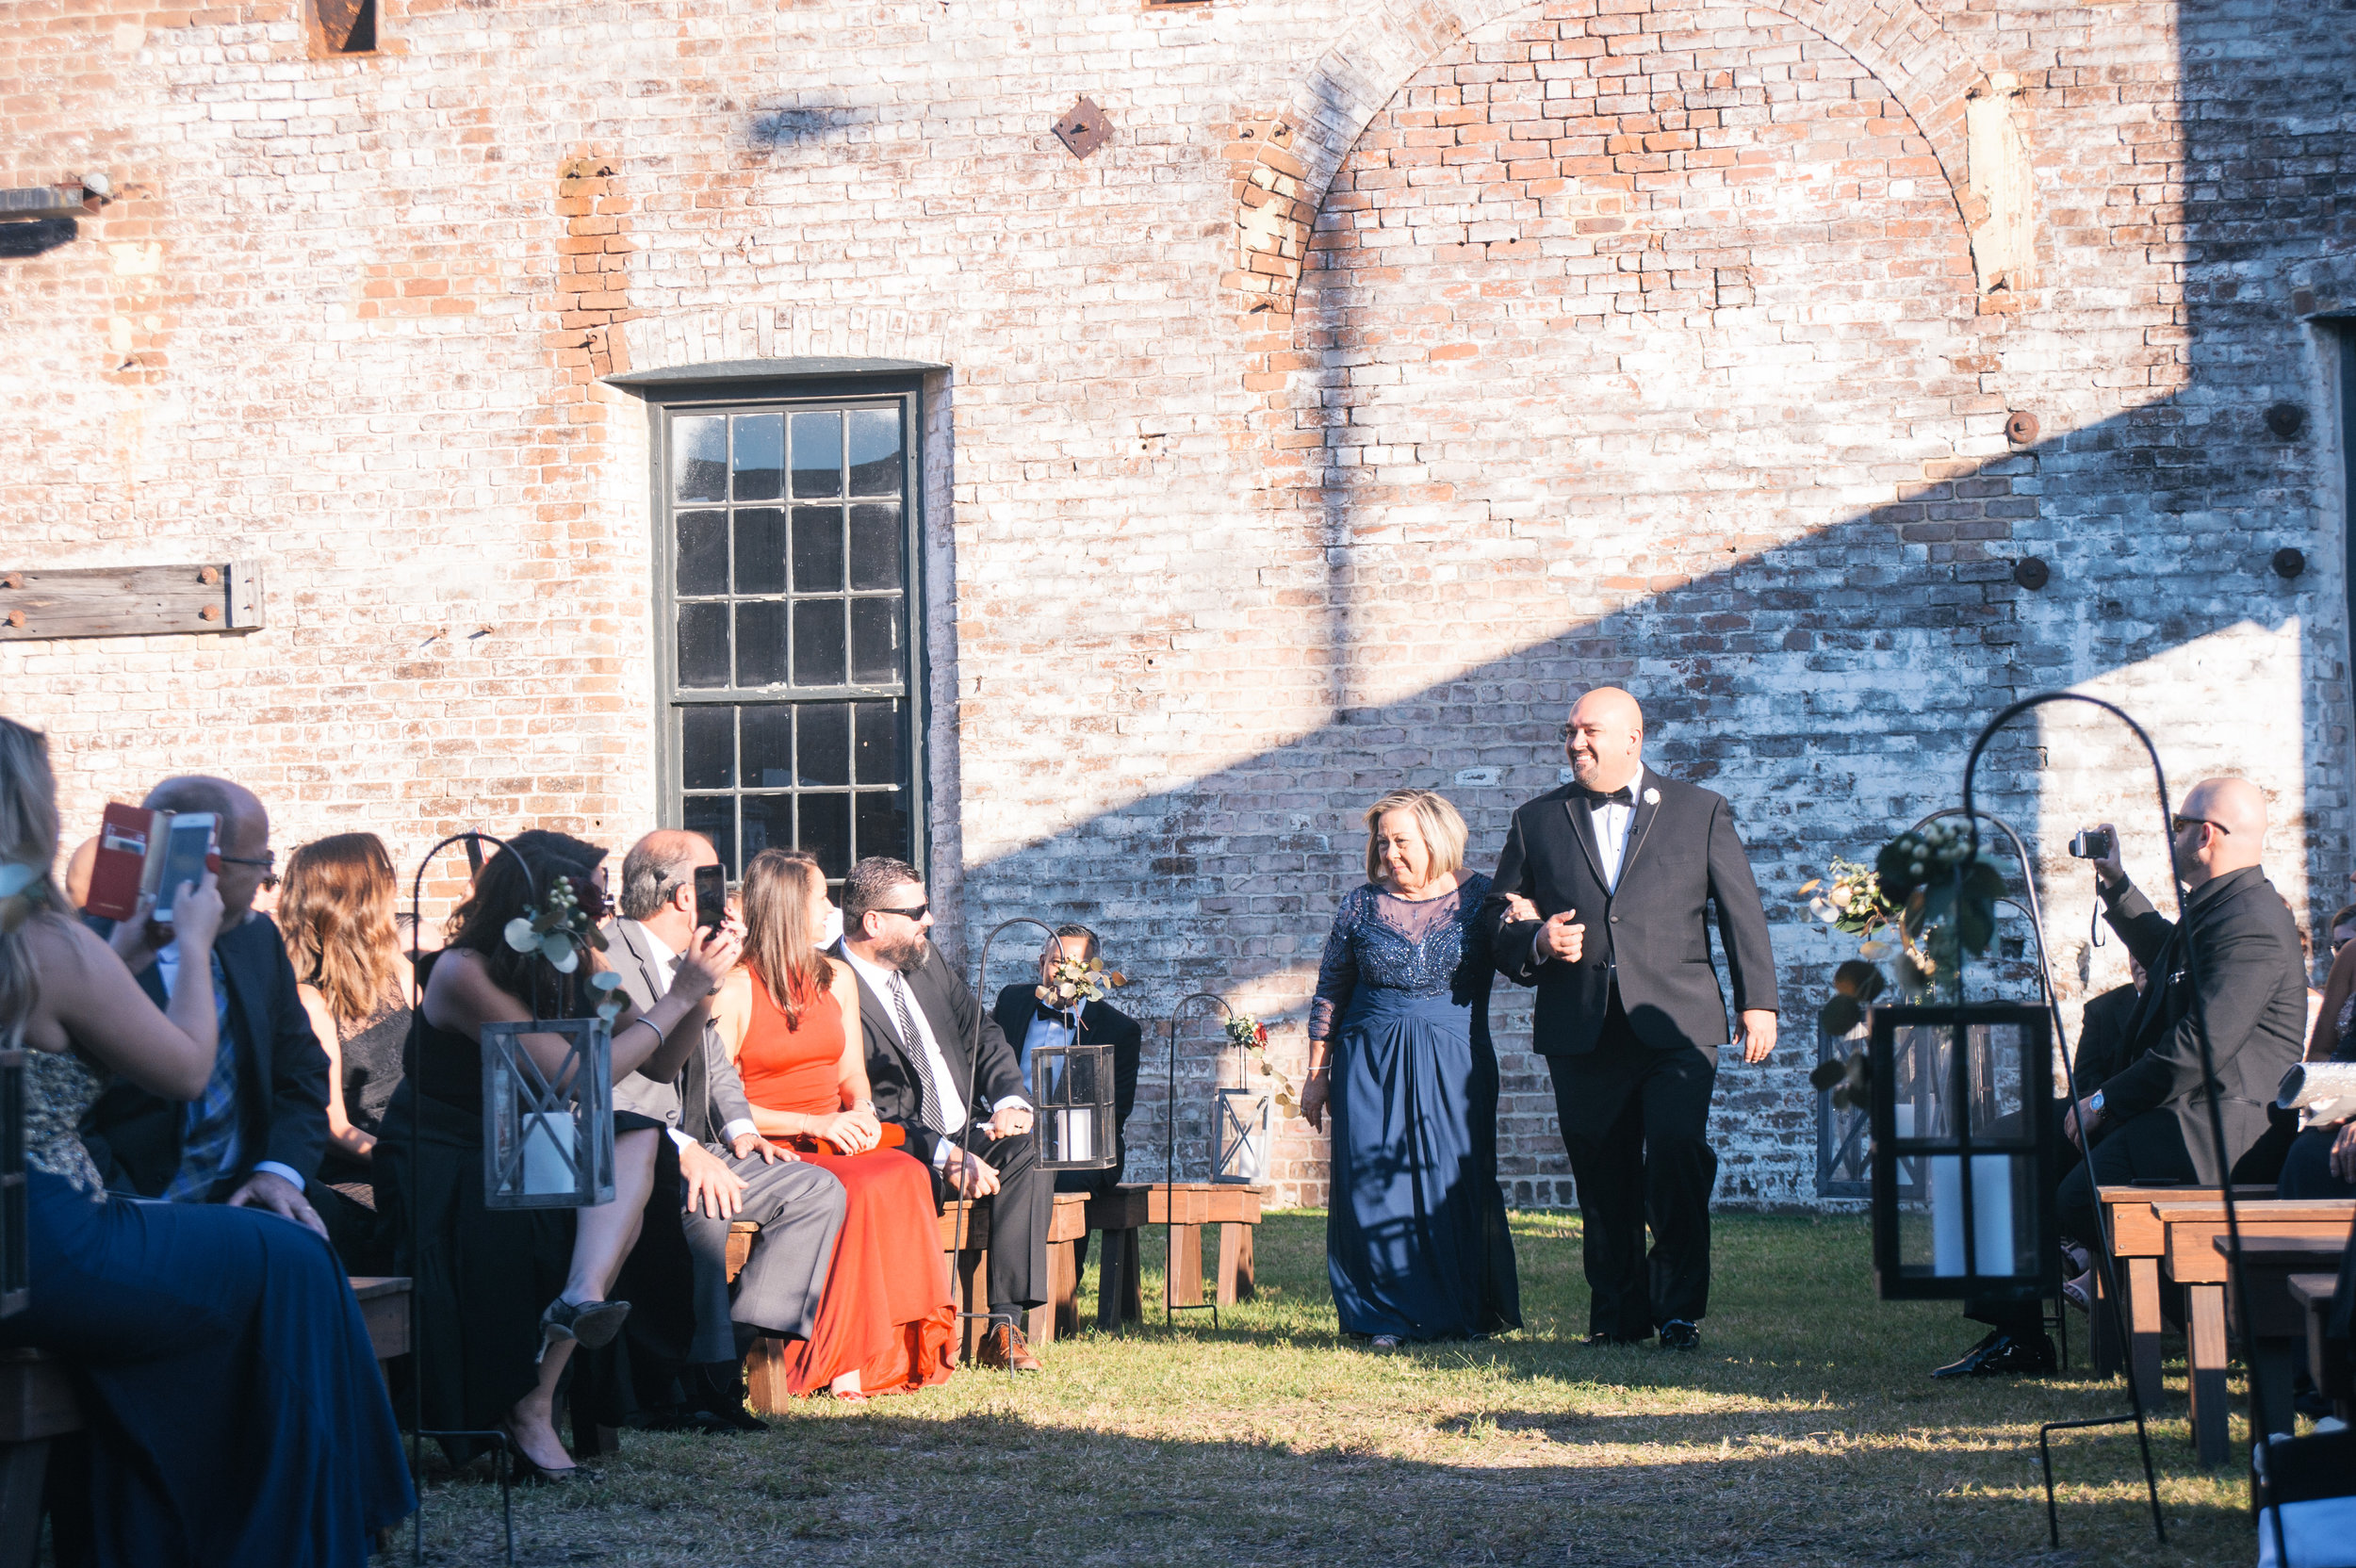 Iggy-and-yesenia-savannah-railroad-museum-wedding-meg-hill-photo- (406 of 866).jpg